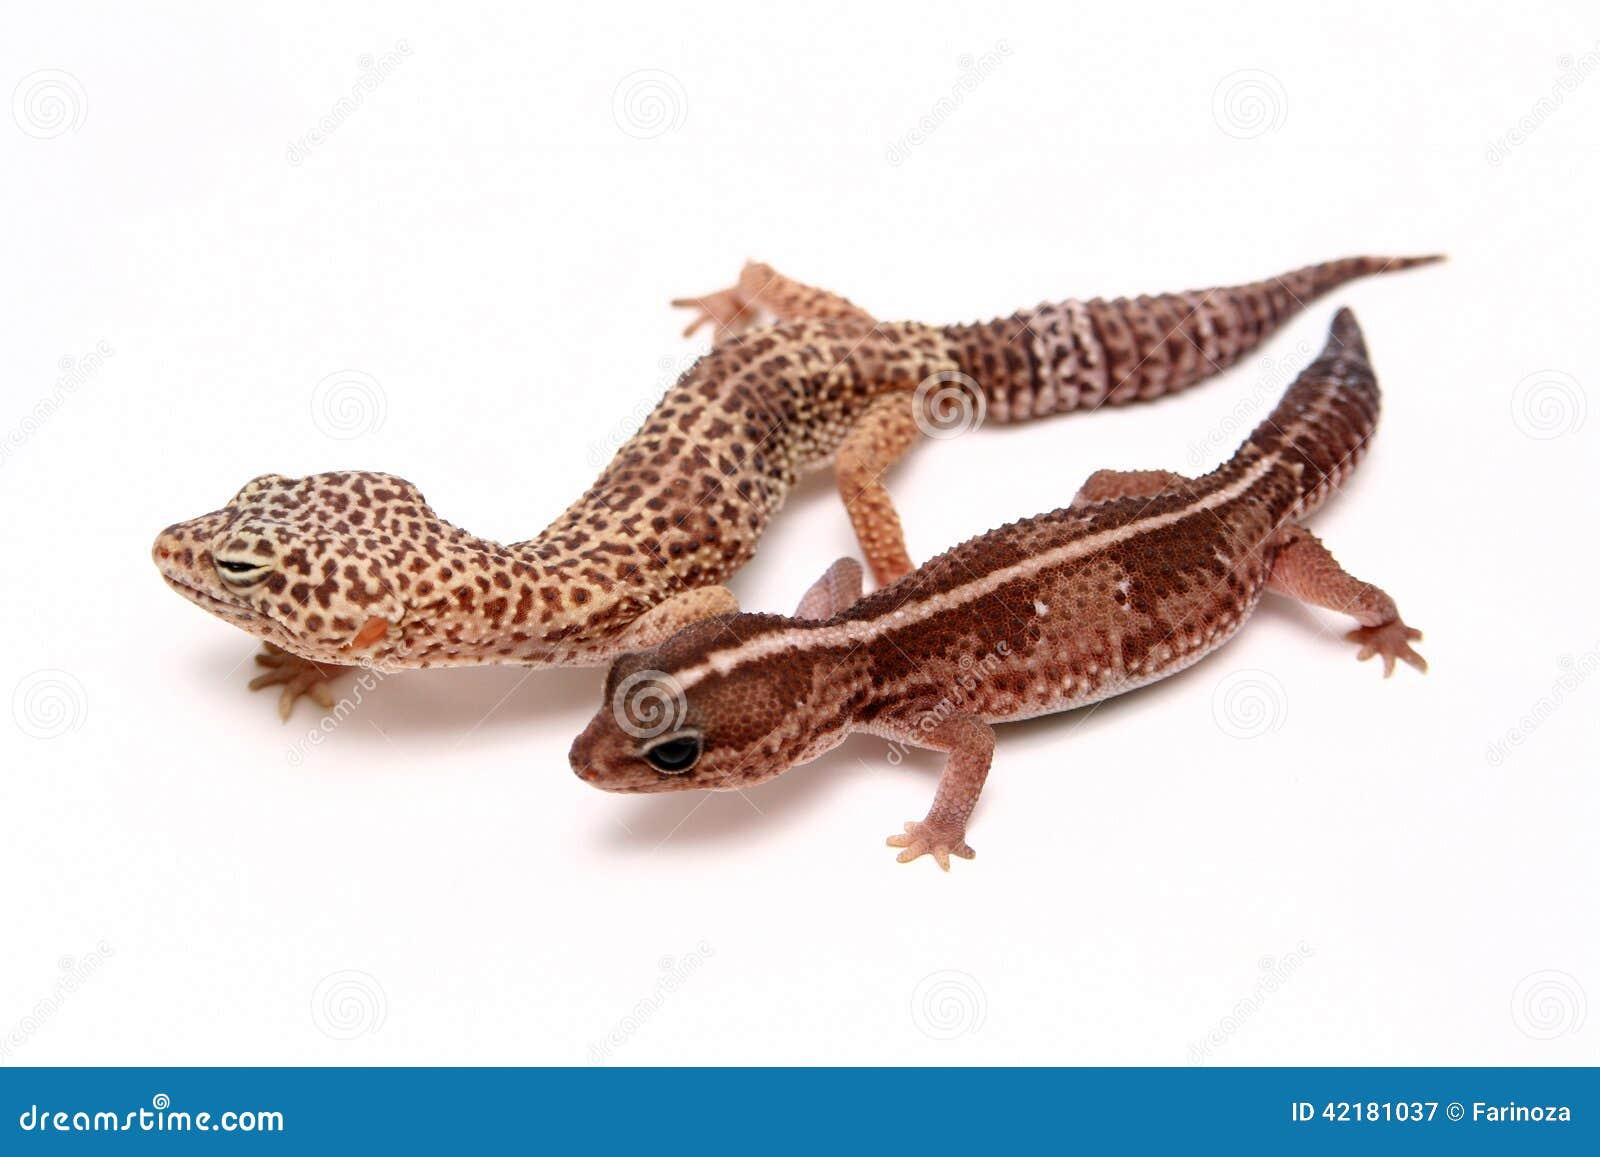 Leopard gecko on white